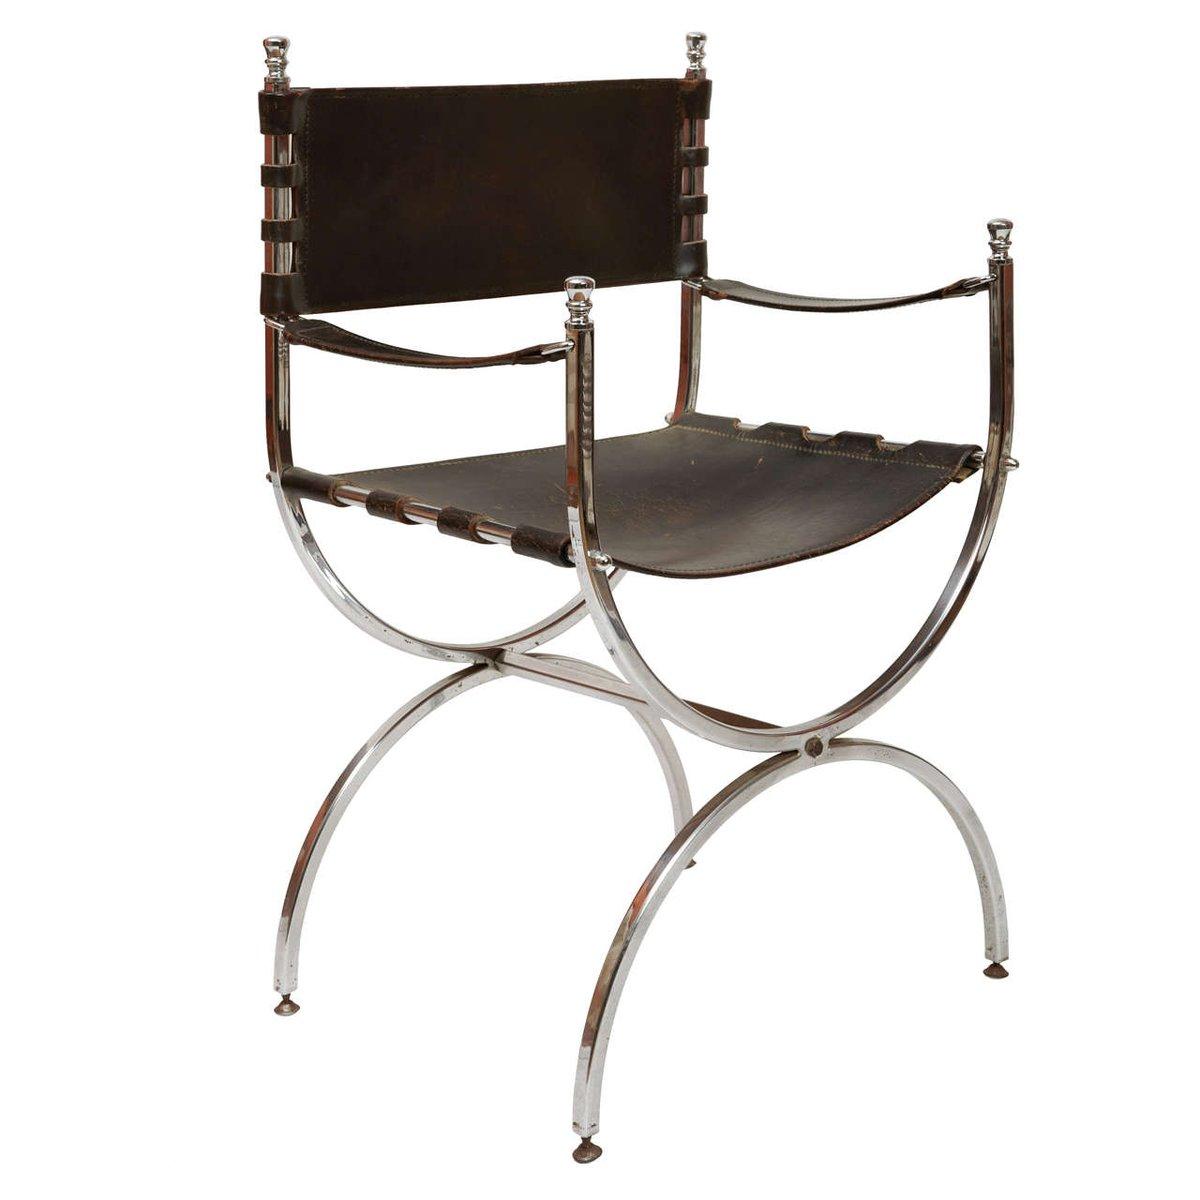 Vintage Sessel aus Eisen & Leder, 1970er